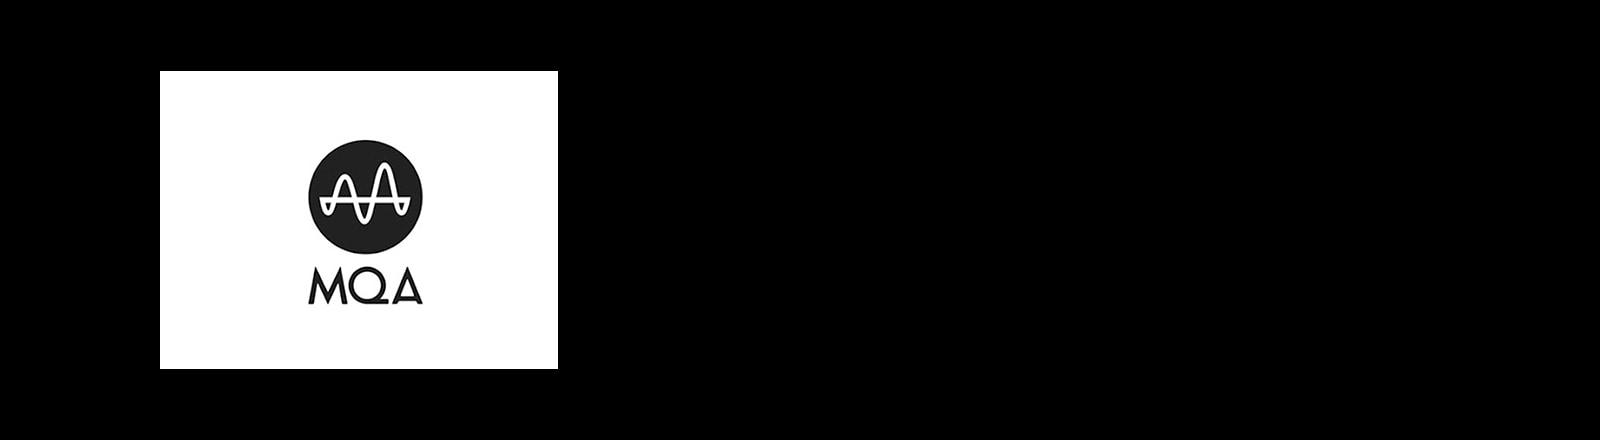 "An image of the ""MQA"" logo"